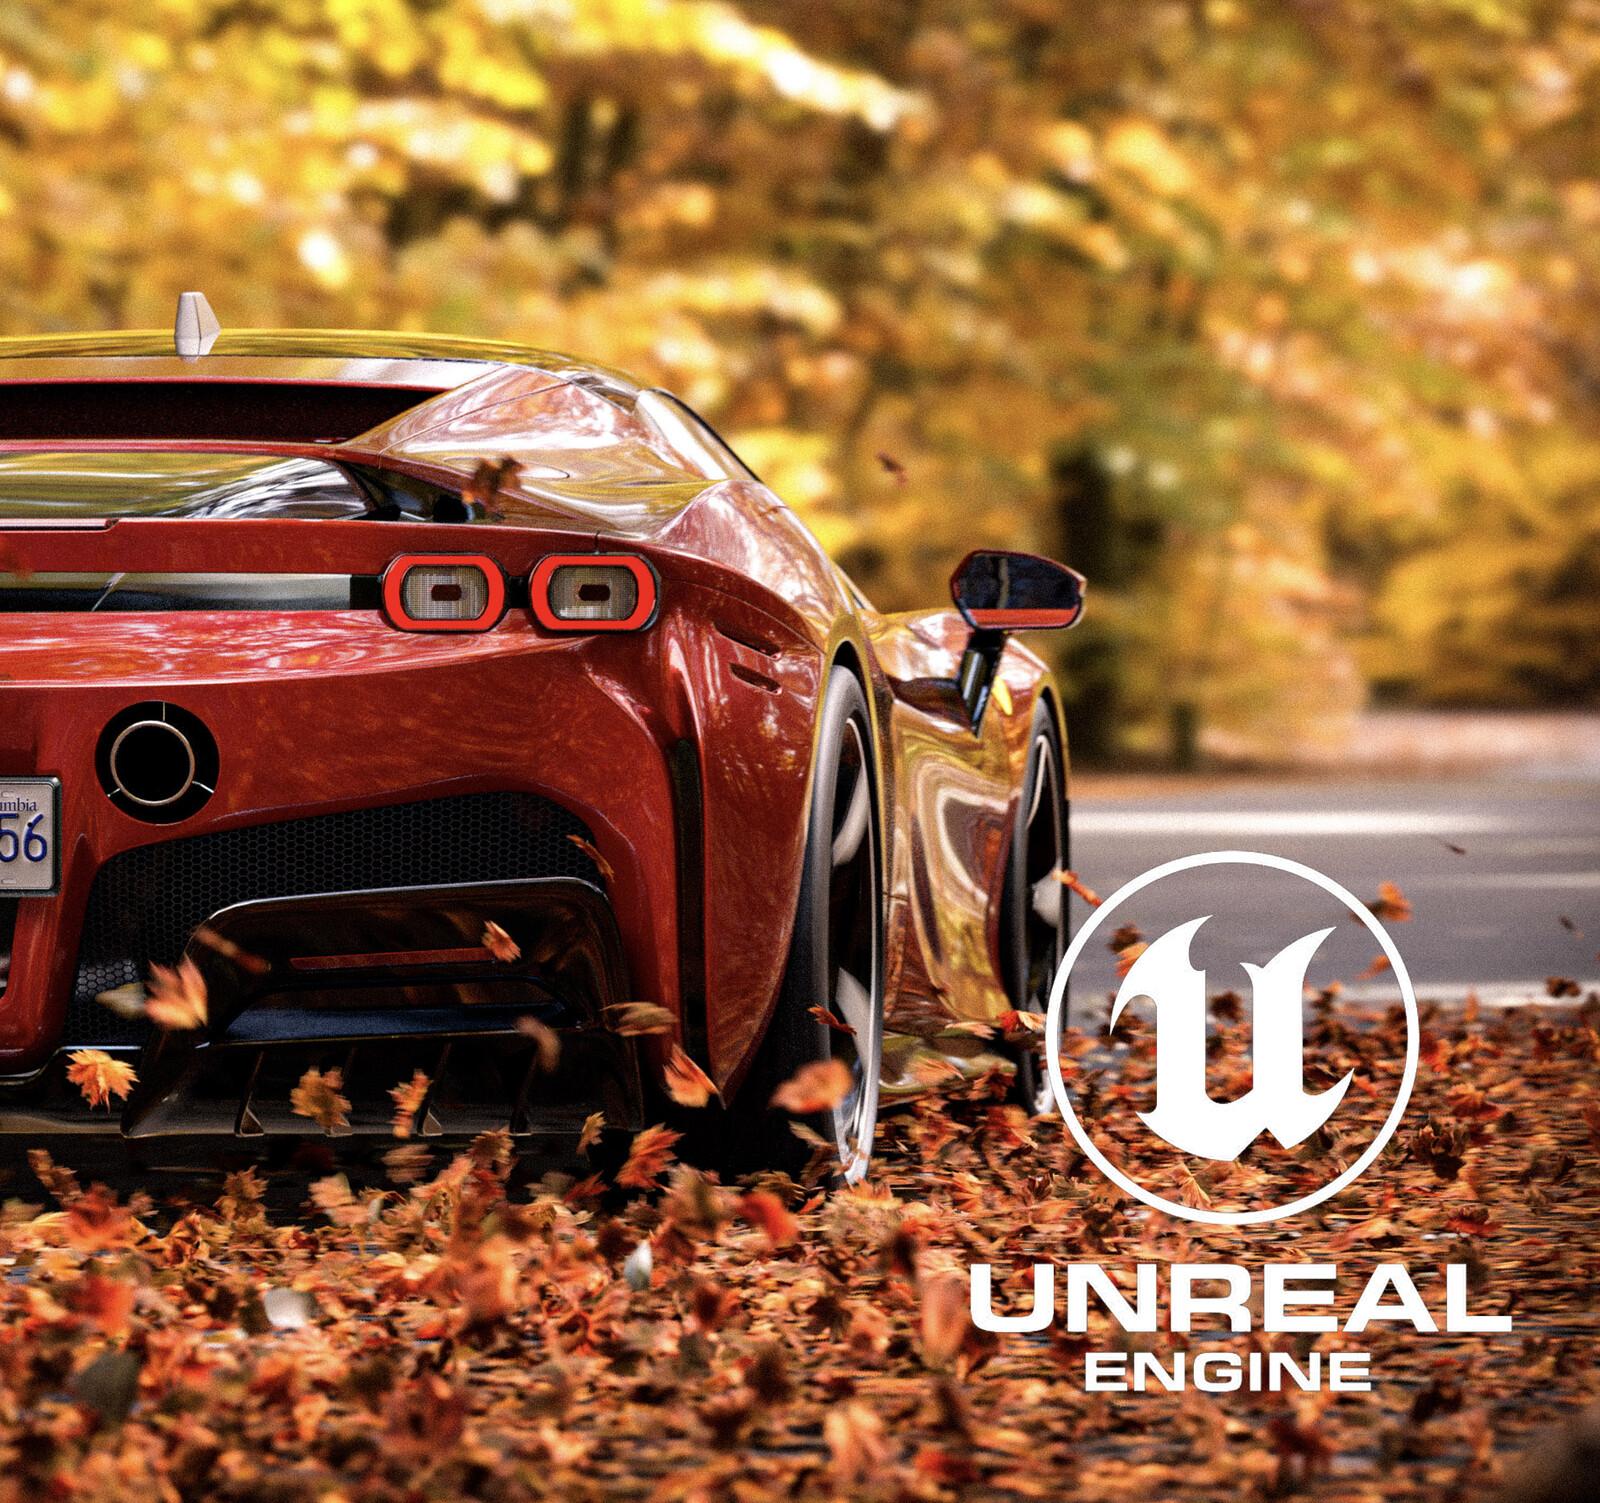 Ferrari SF90 Stradale - Unreal Engine 4 Automotive Rendering